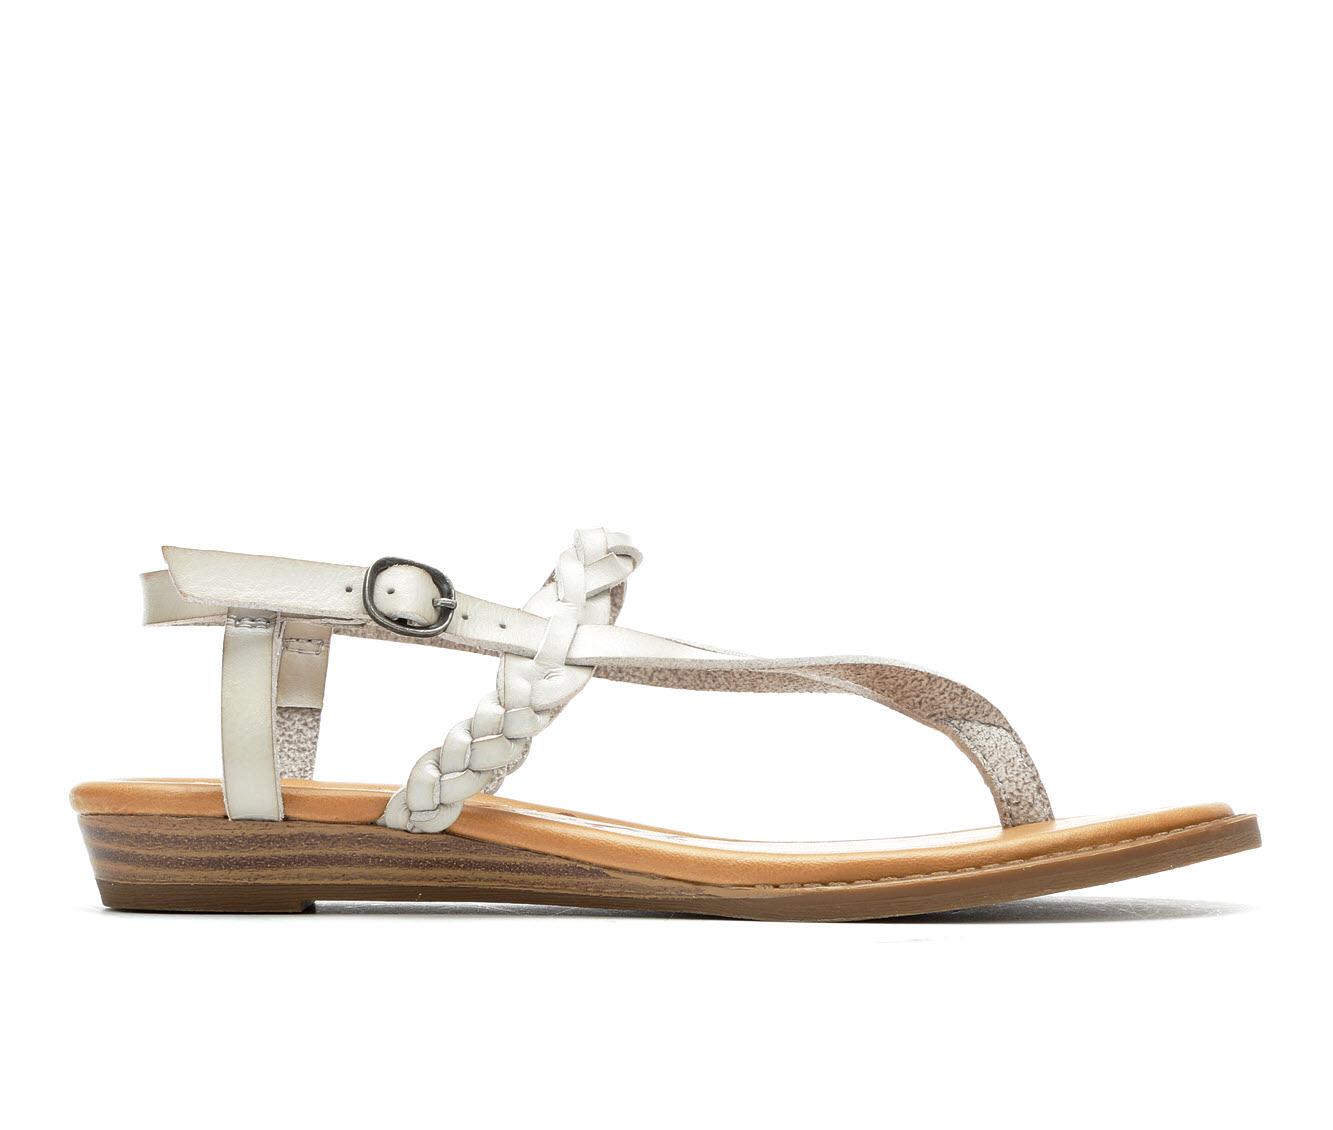 Blowfish Malibu Berg-B Women's Sandal (Gray Faux Leather)